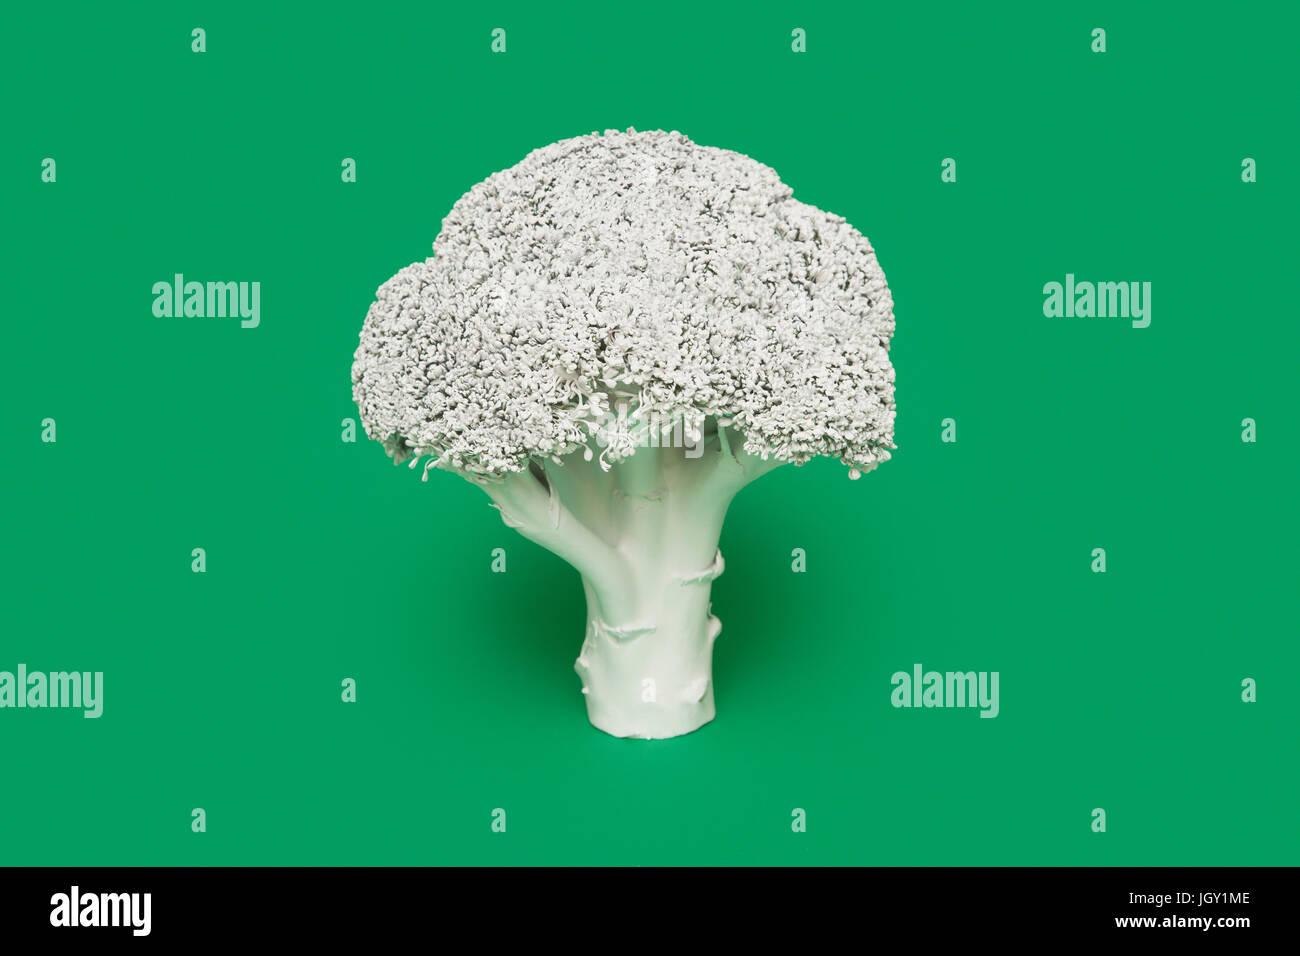 Le brocoli peint en blanc sur fond vert Photo Stock